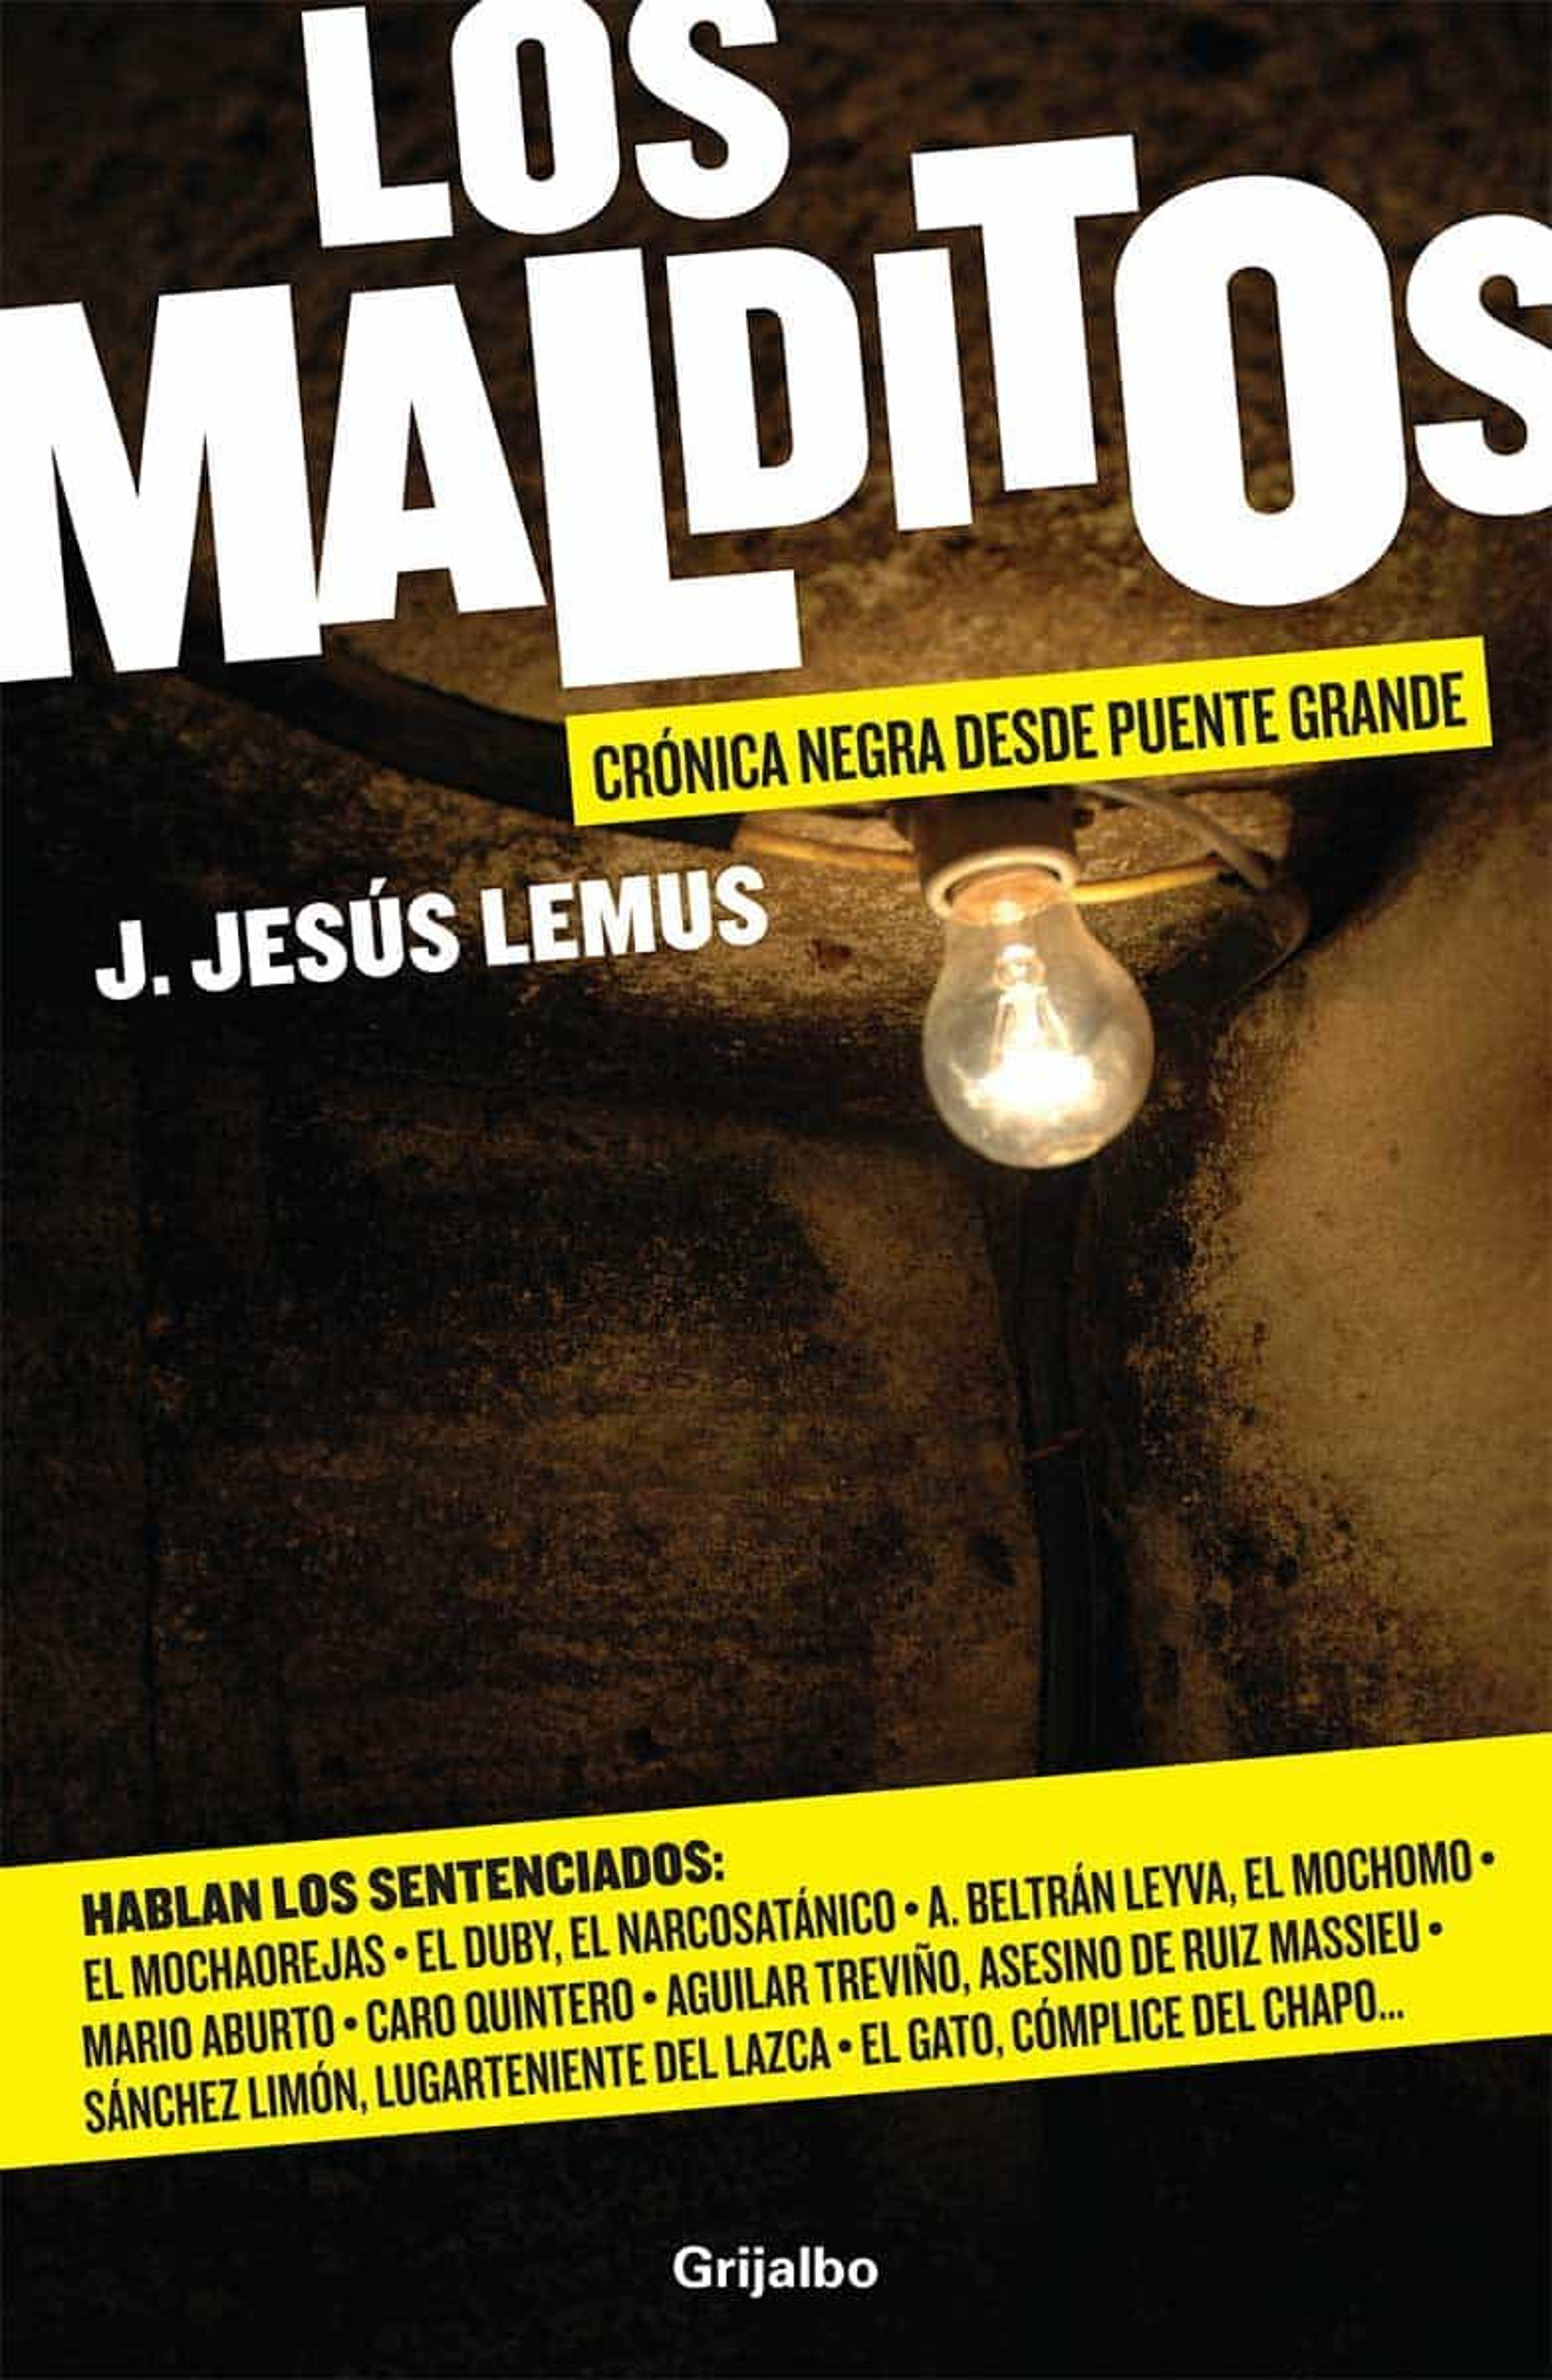 los malditos jesús lemus libro completo pdf gratis